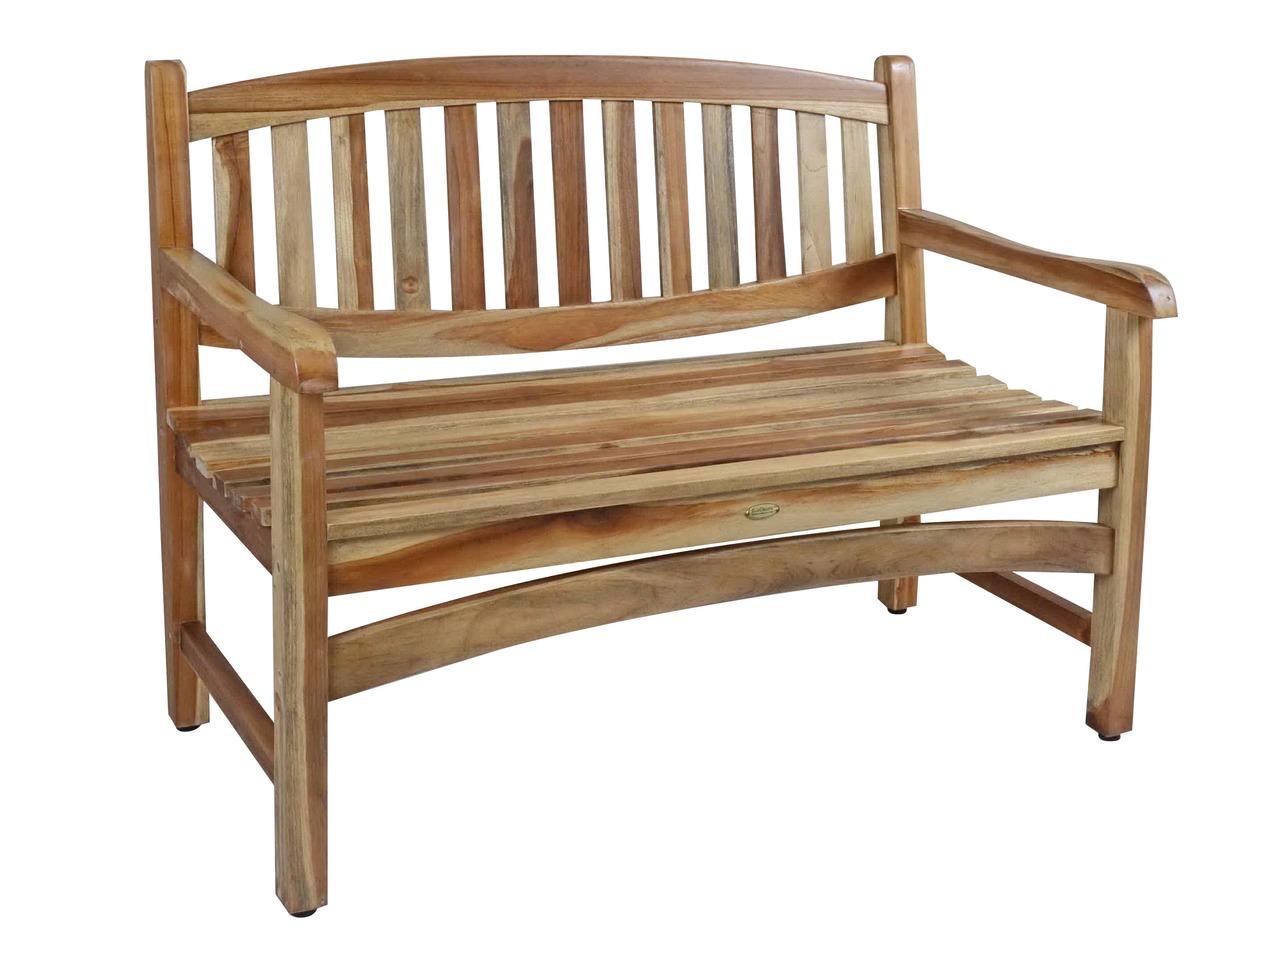 Fantastic Kent Garden 47 Inch Length Solid Teak Outdoor Garden Bench Cjindustries Chair Design For Home Cjindustriesco